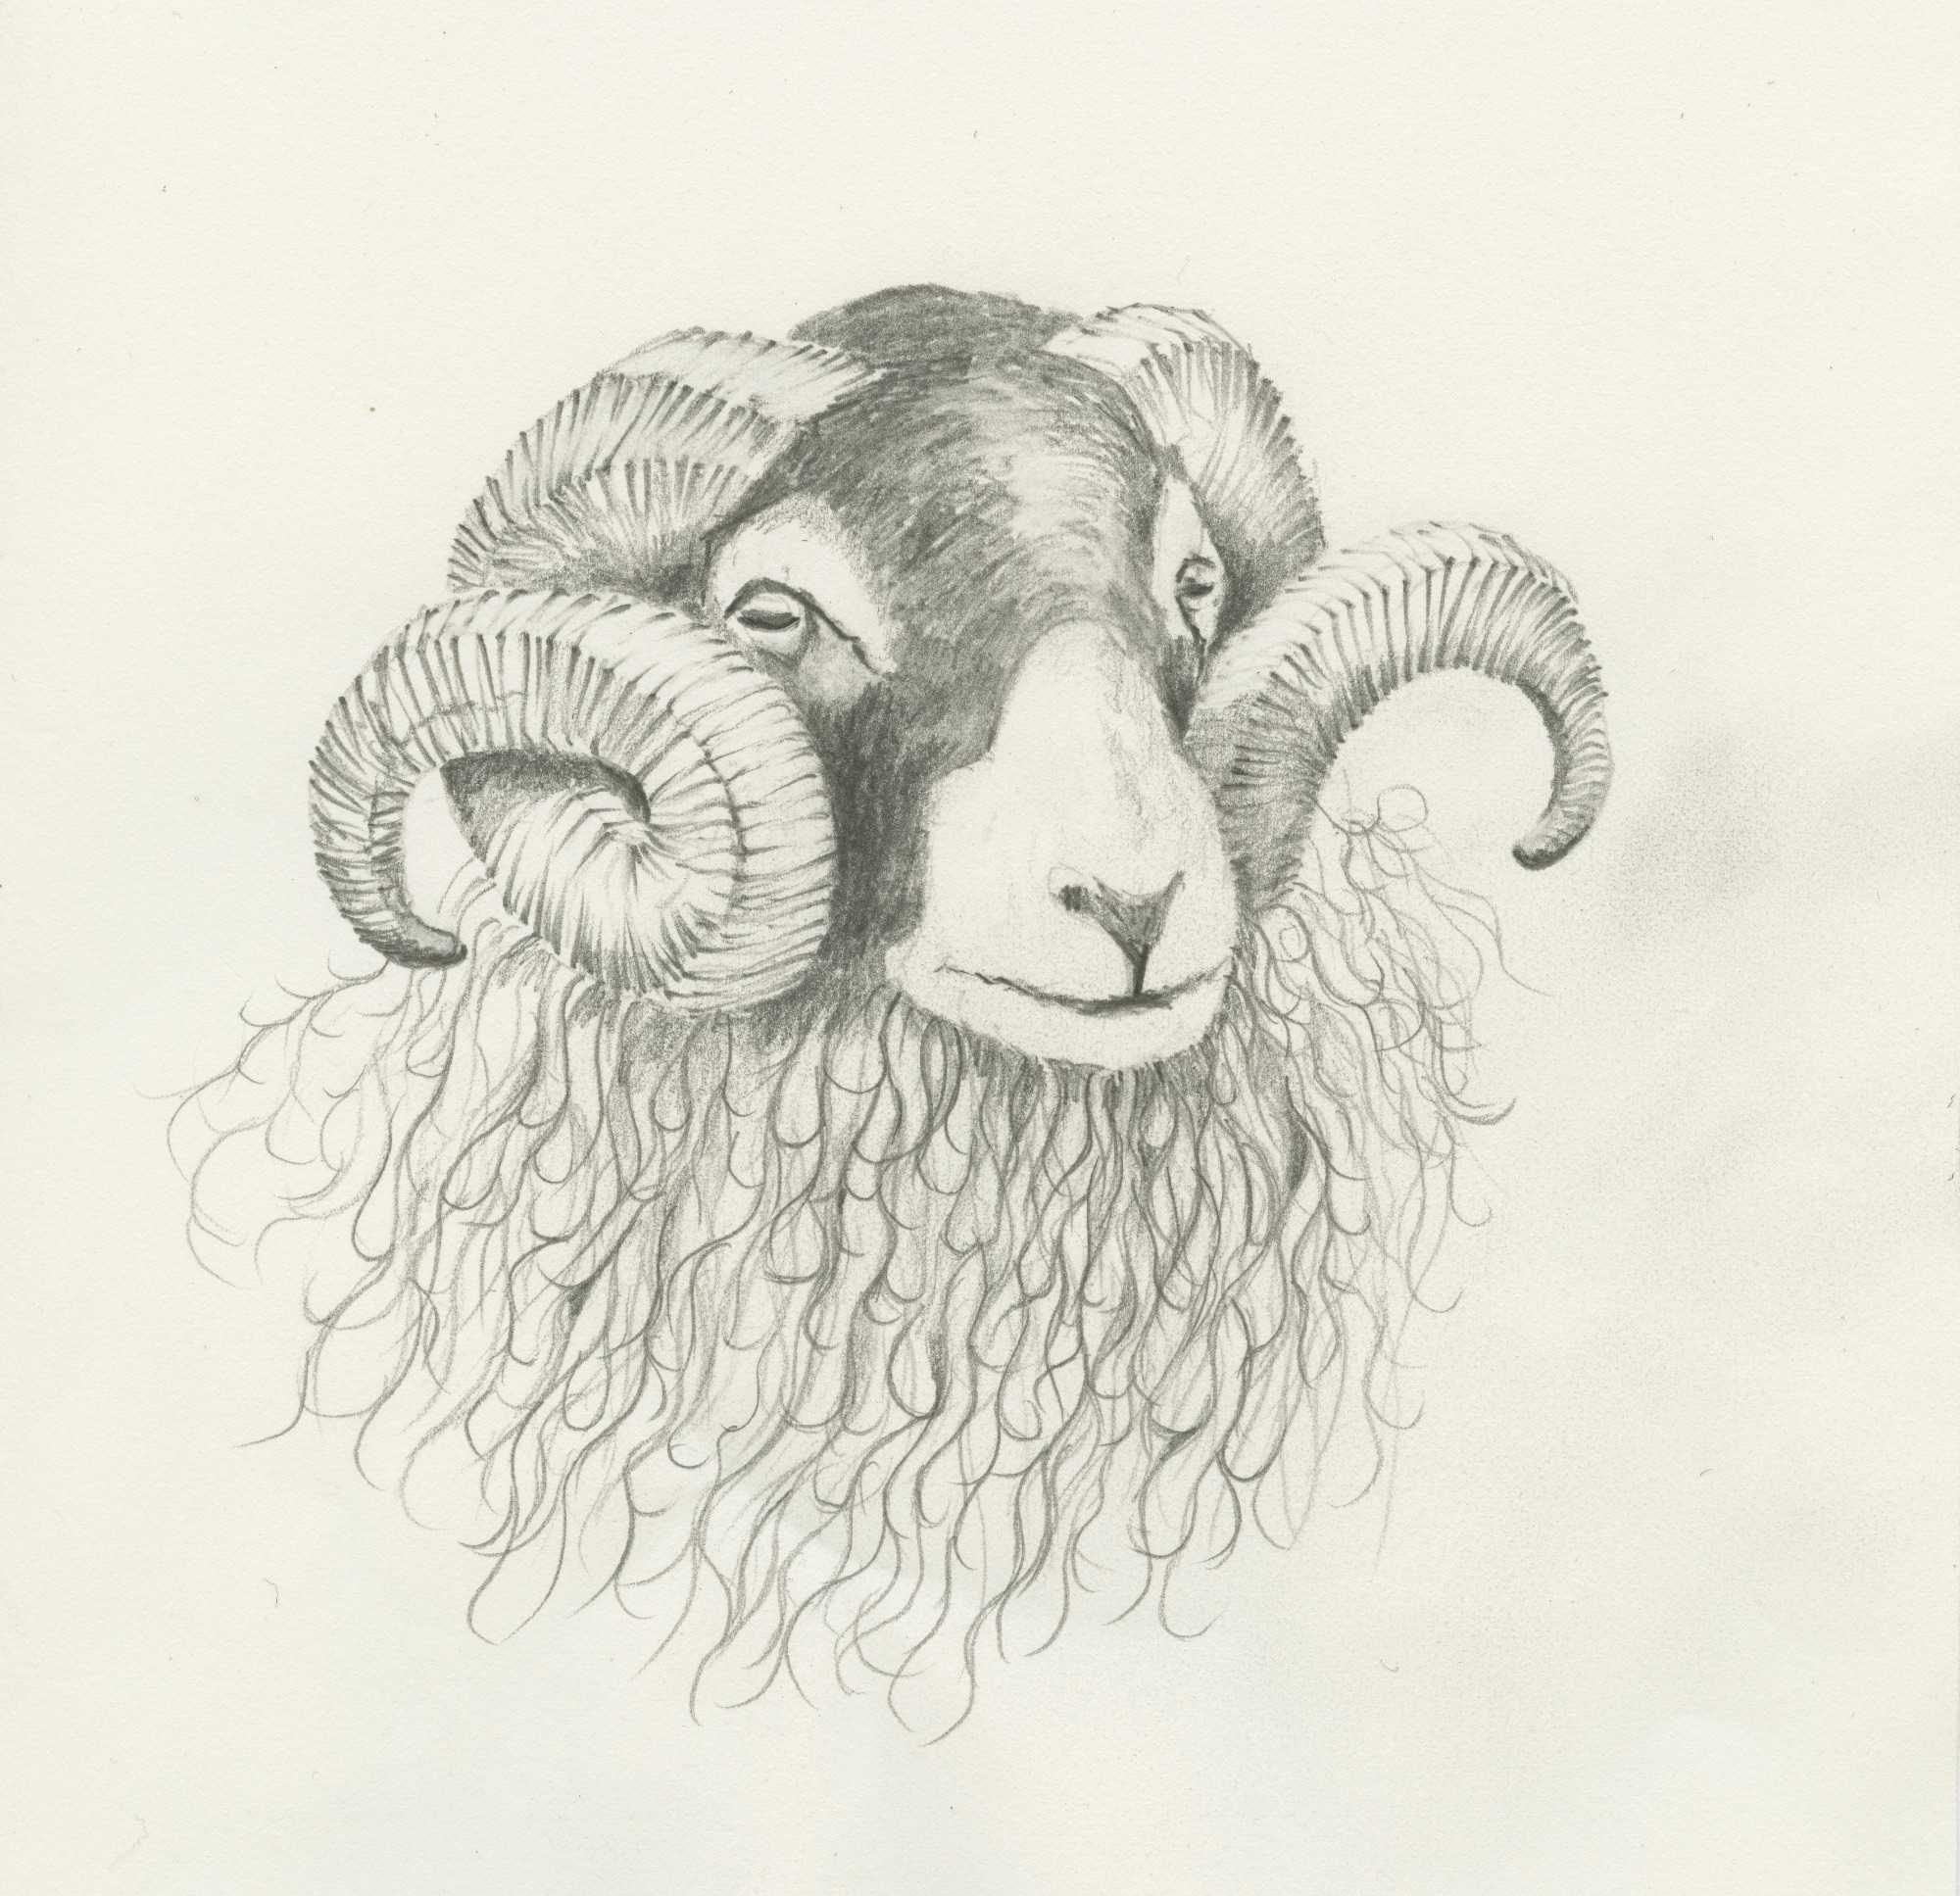 015 Bighorns Swaledale Ram